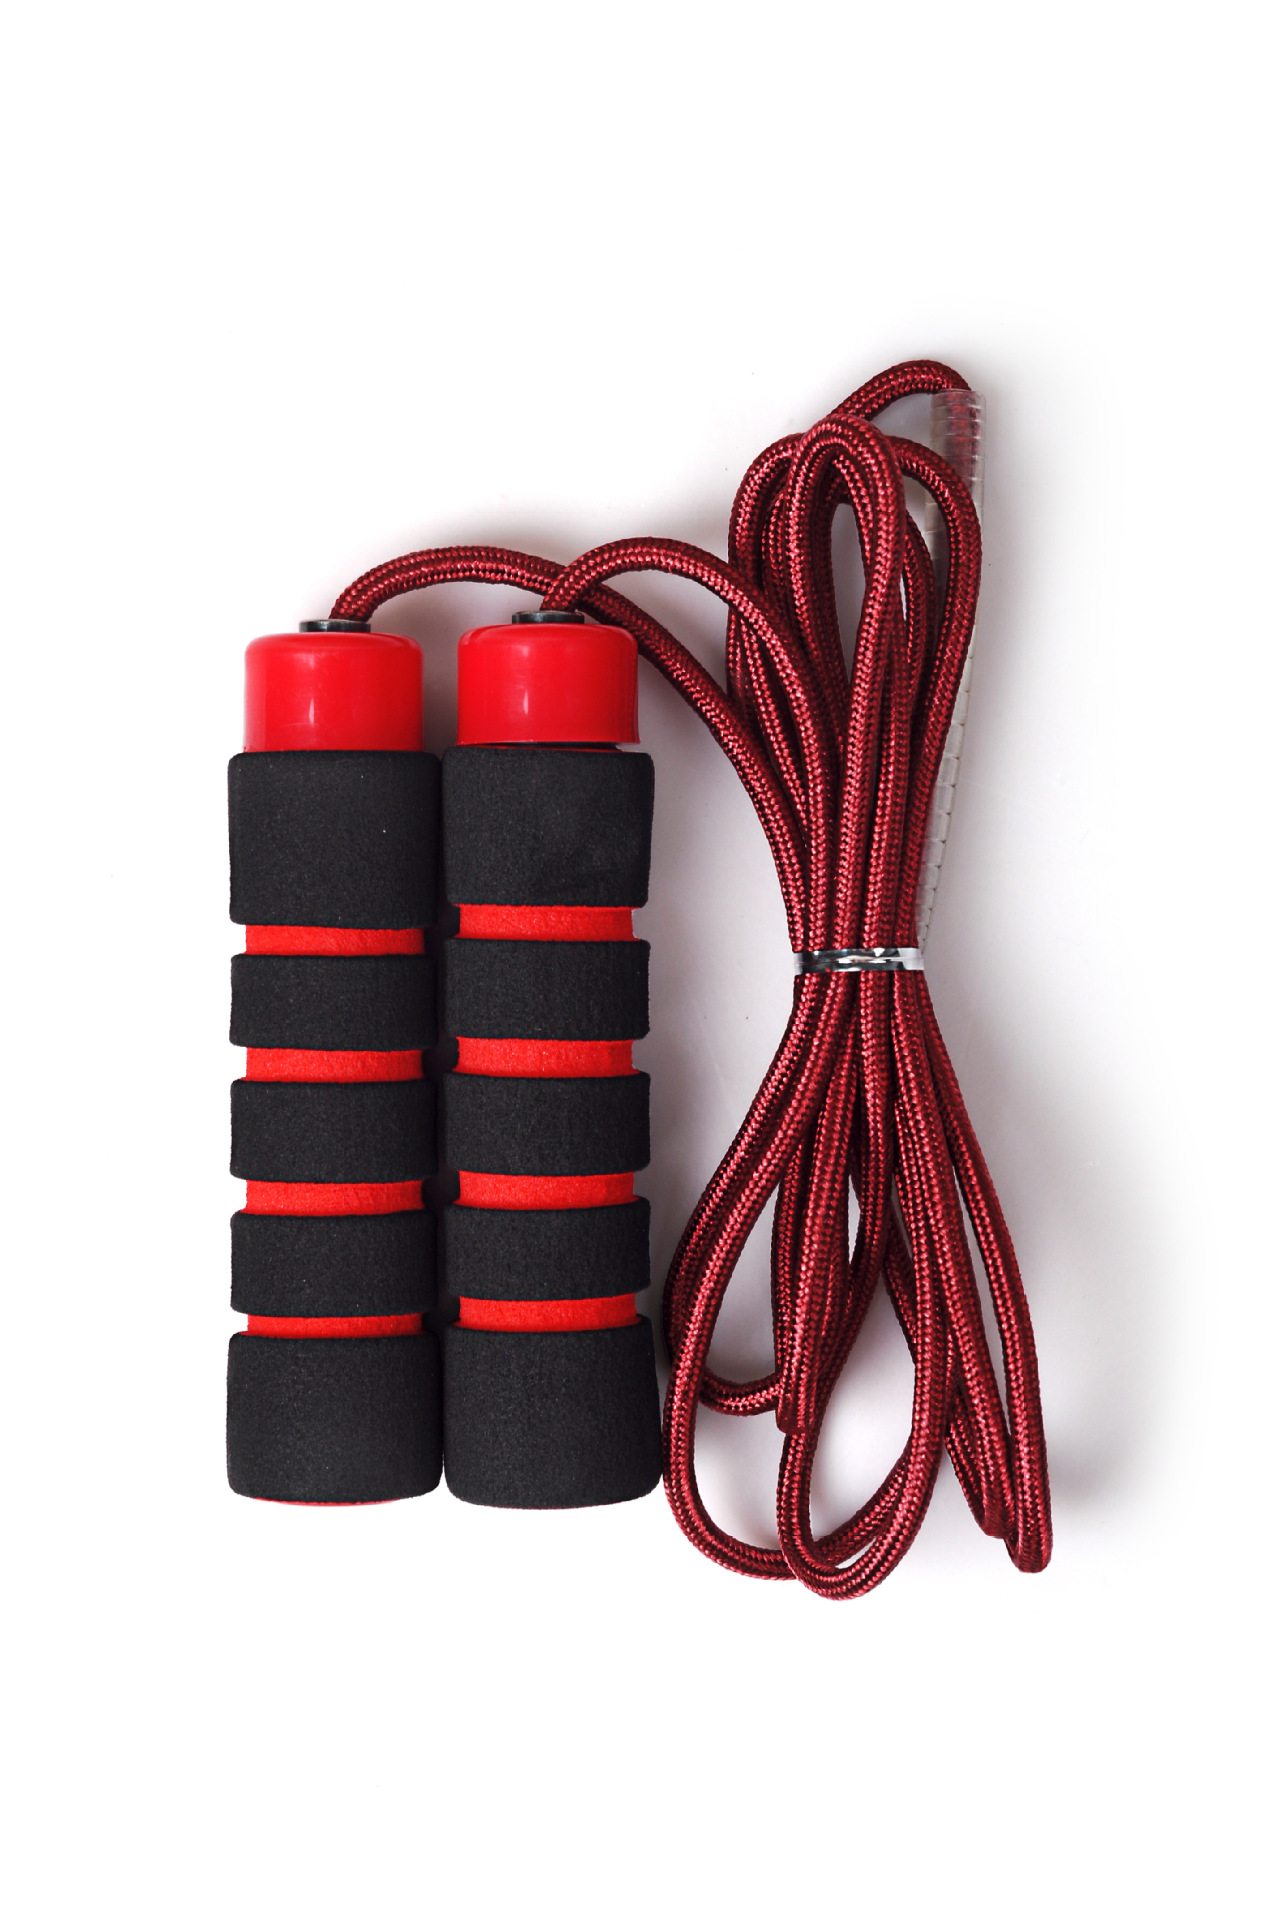 [Wei Masi] Fitness Jump Rope Double Layer Weaving Nylon Foam Plastic Handle Adult Children Sports Training Rope